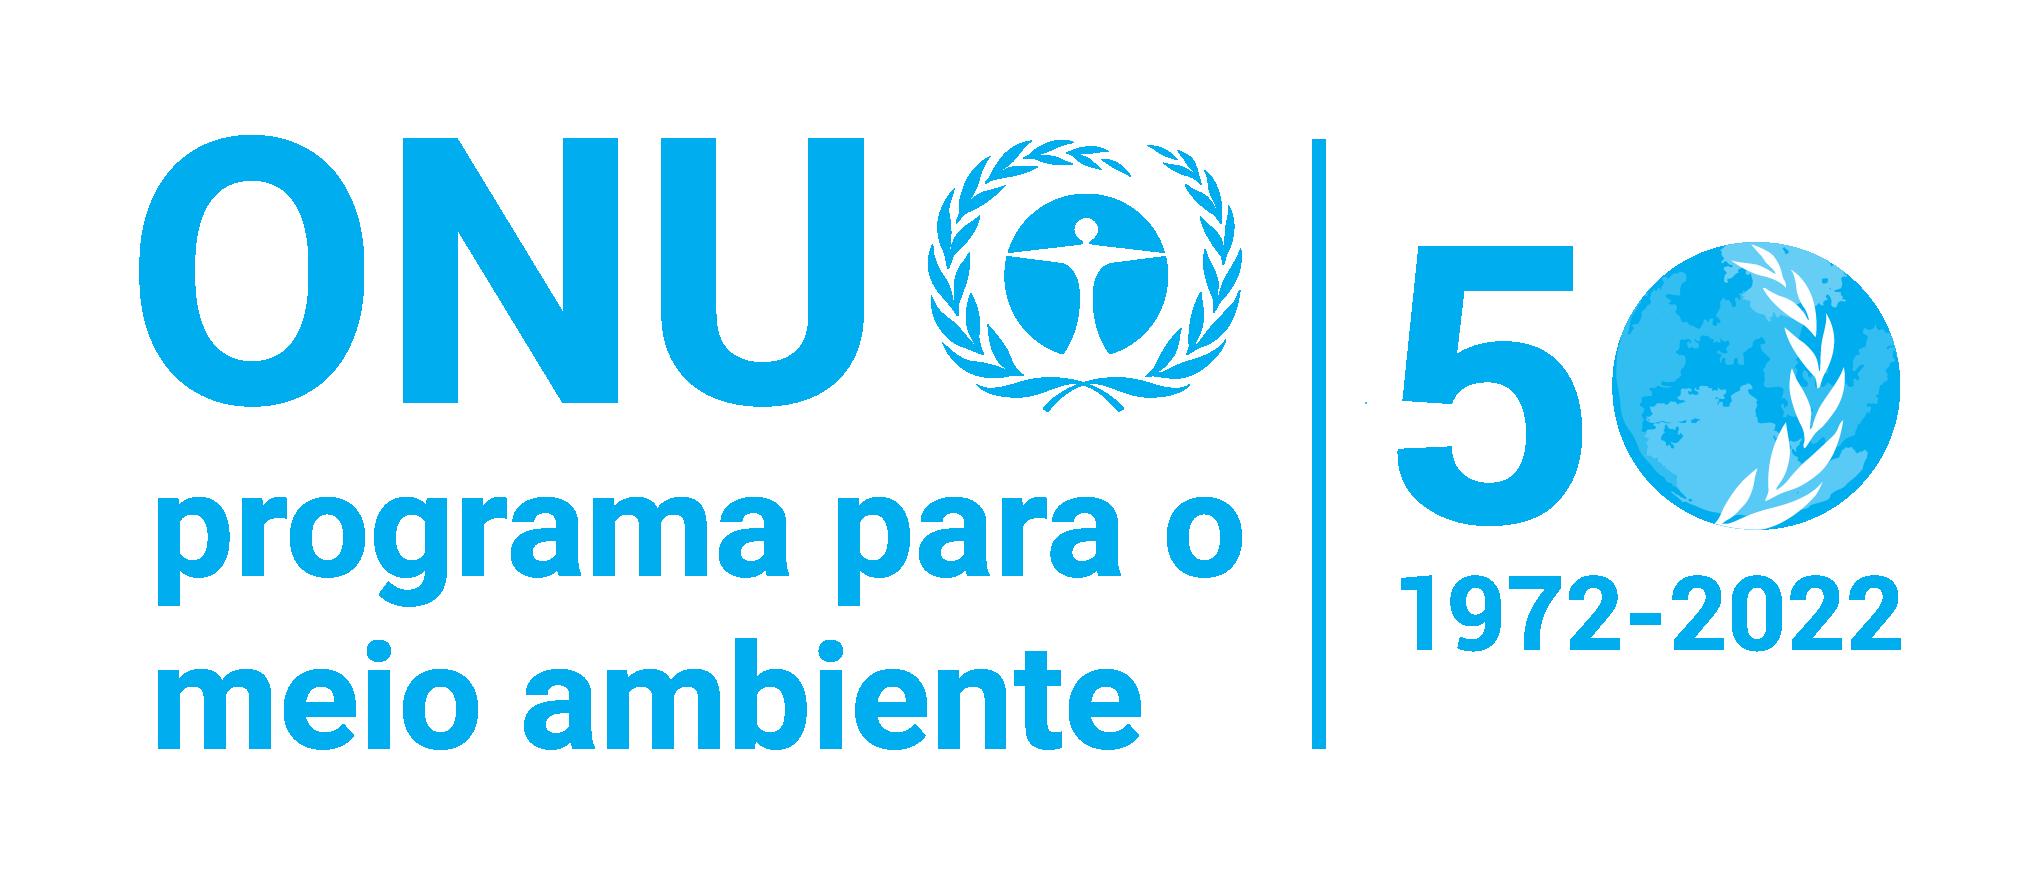 UNEP_50_Port_blue_-_Camila_Hira